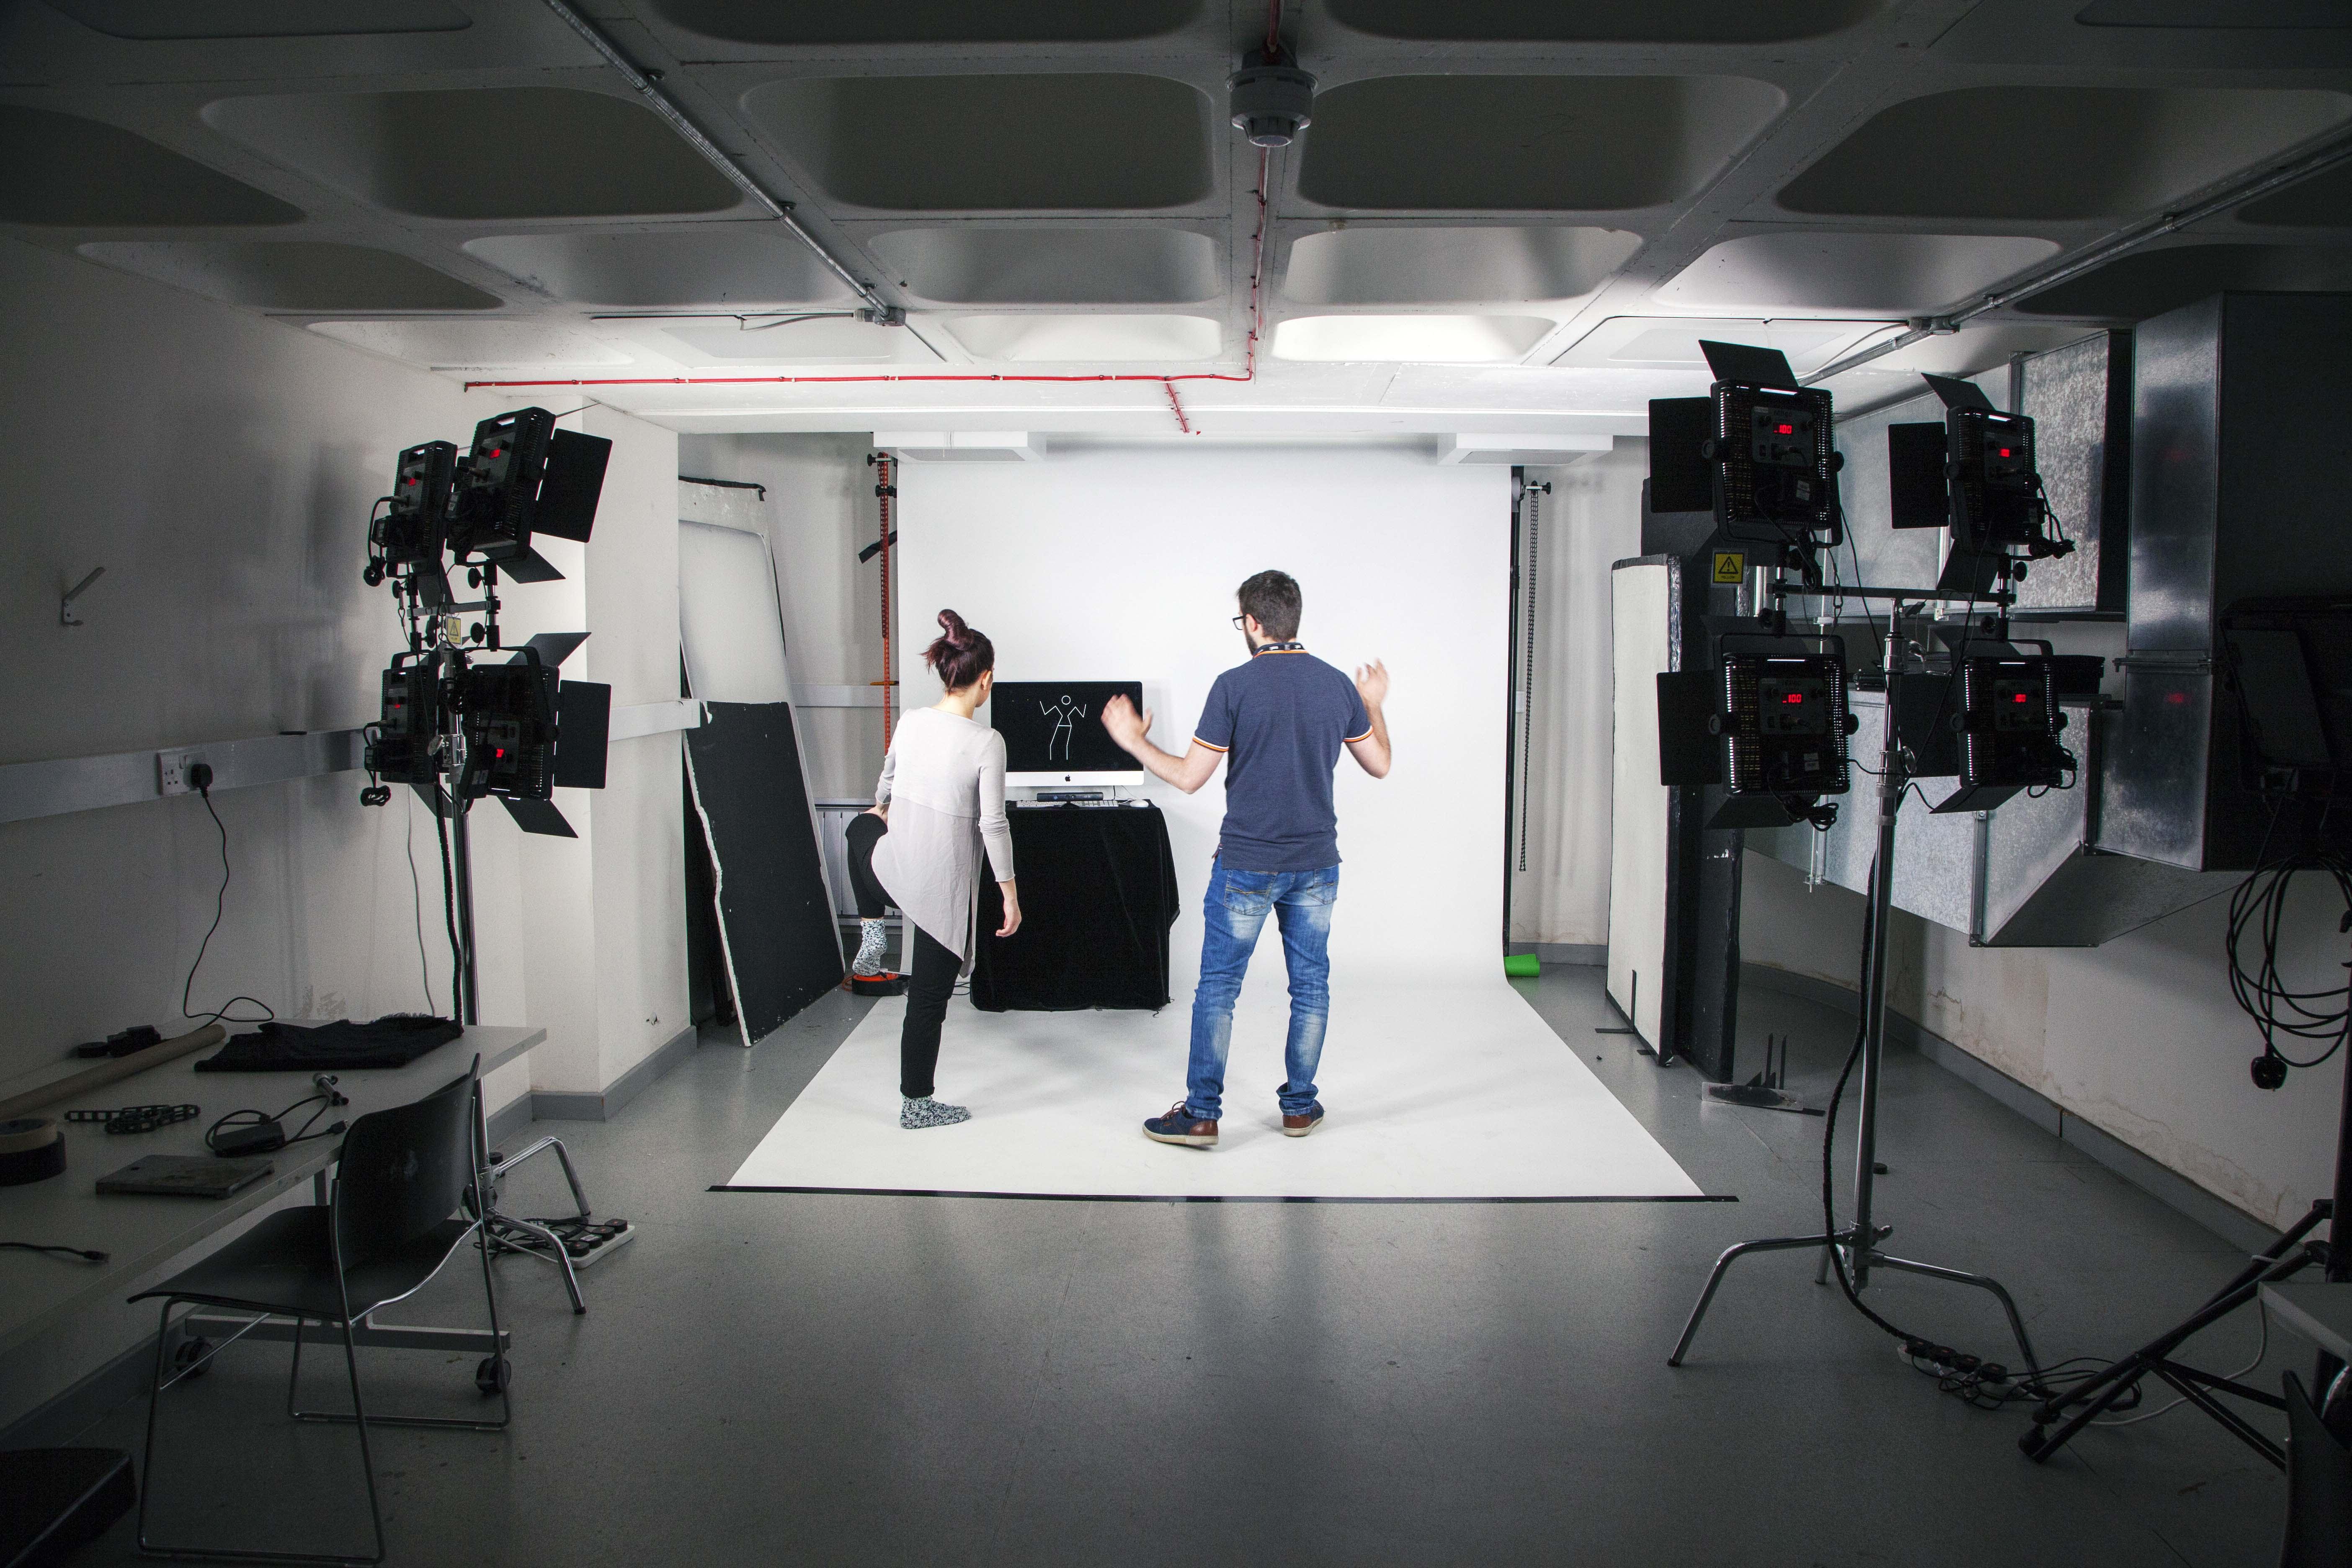 Fabio-Amelia-Dance-Score.jpg